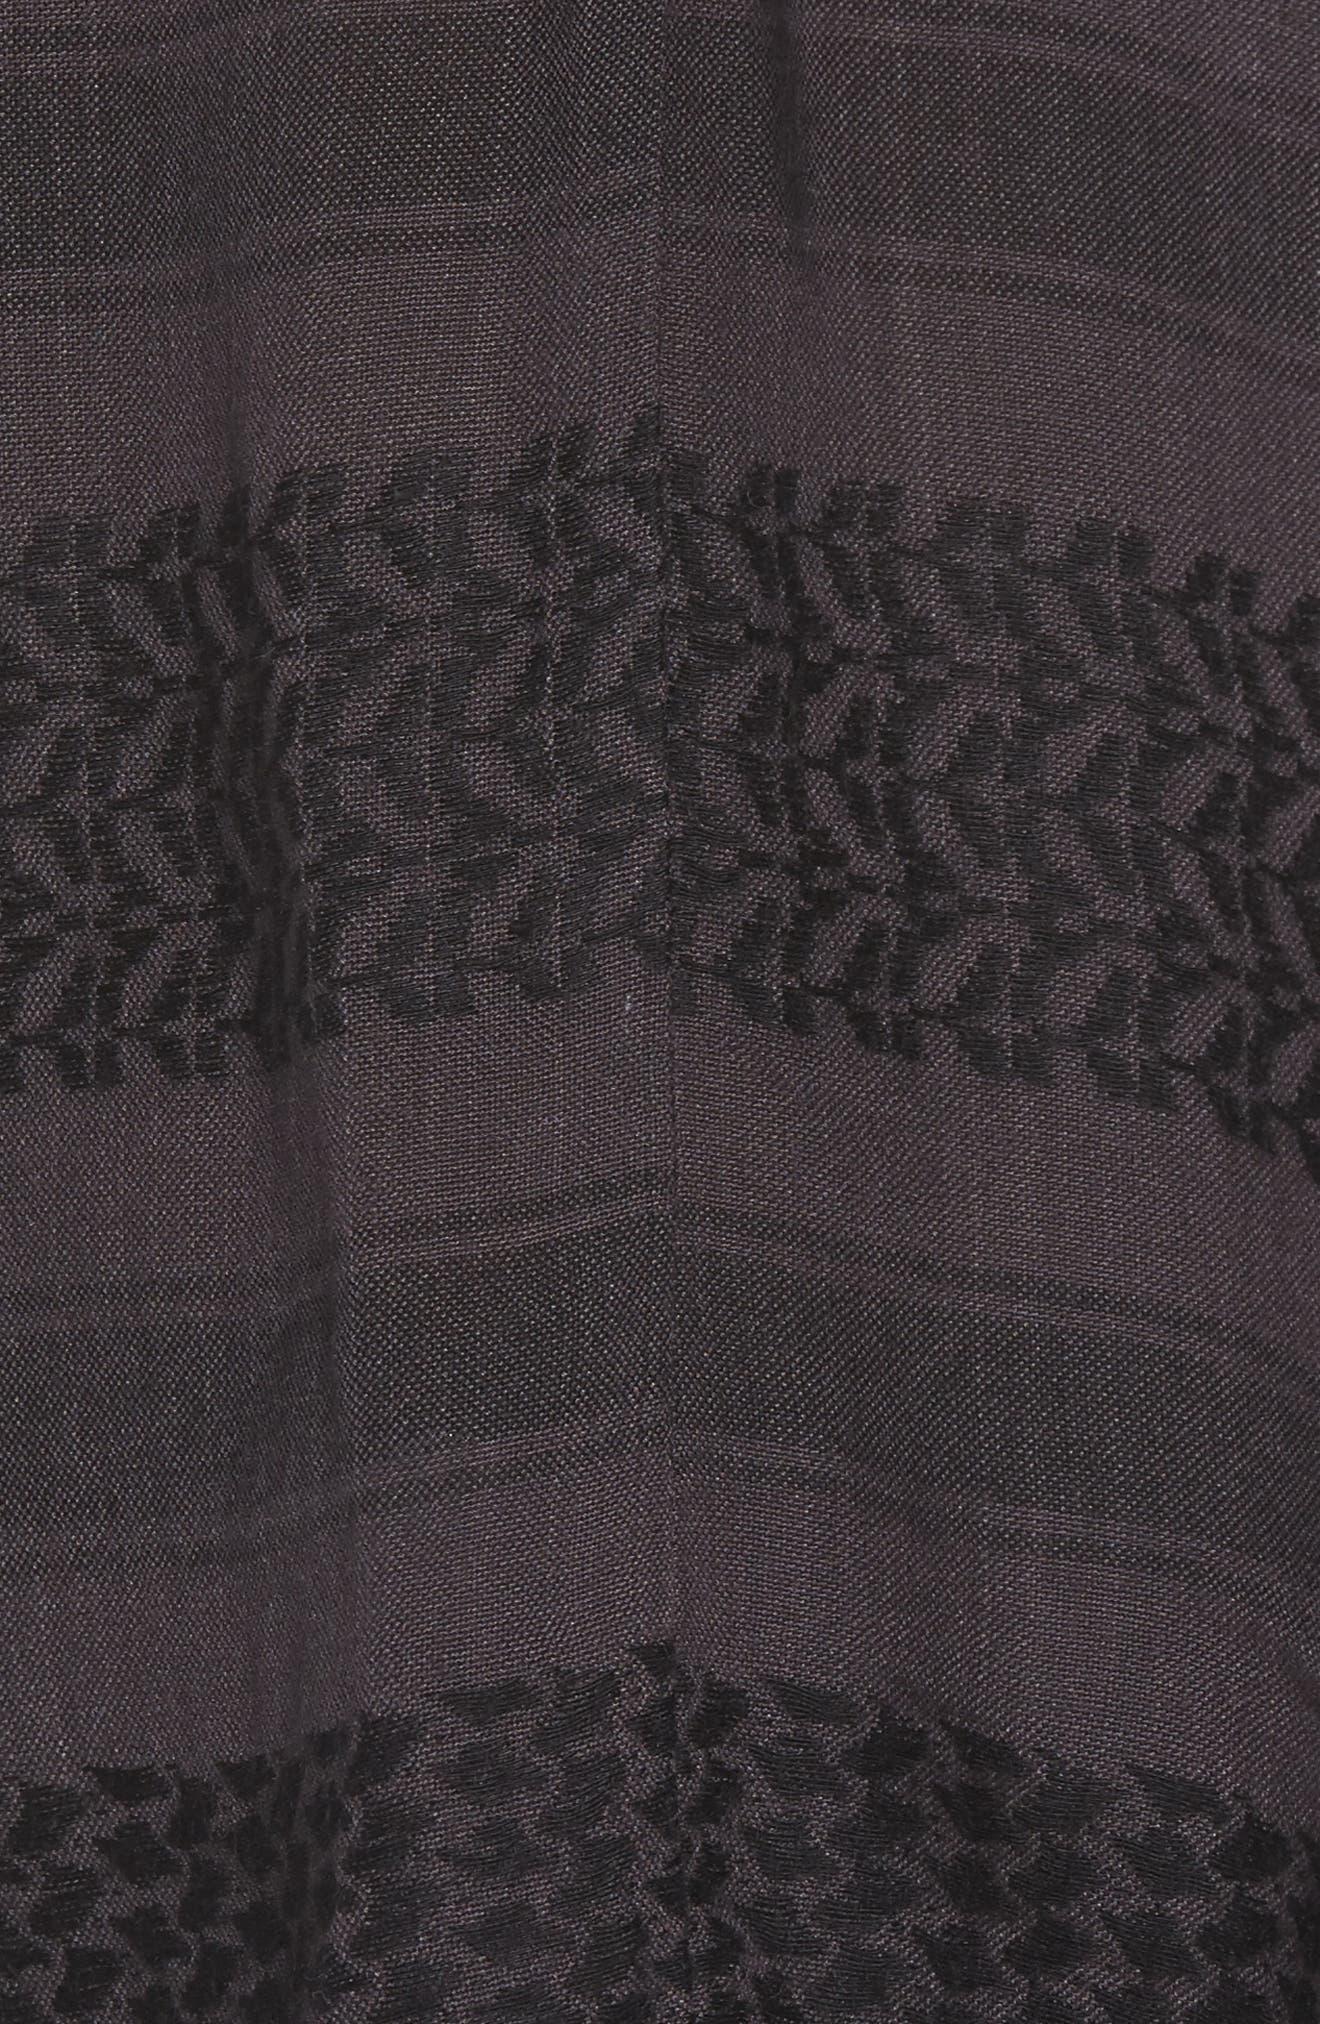 Lily Pullover Blouse,                             Alternate thumbnail 5, color,                             ONYX JACQUARD